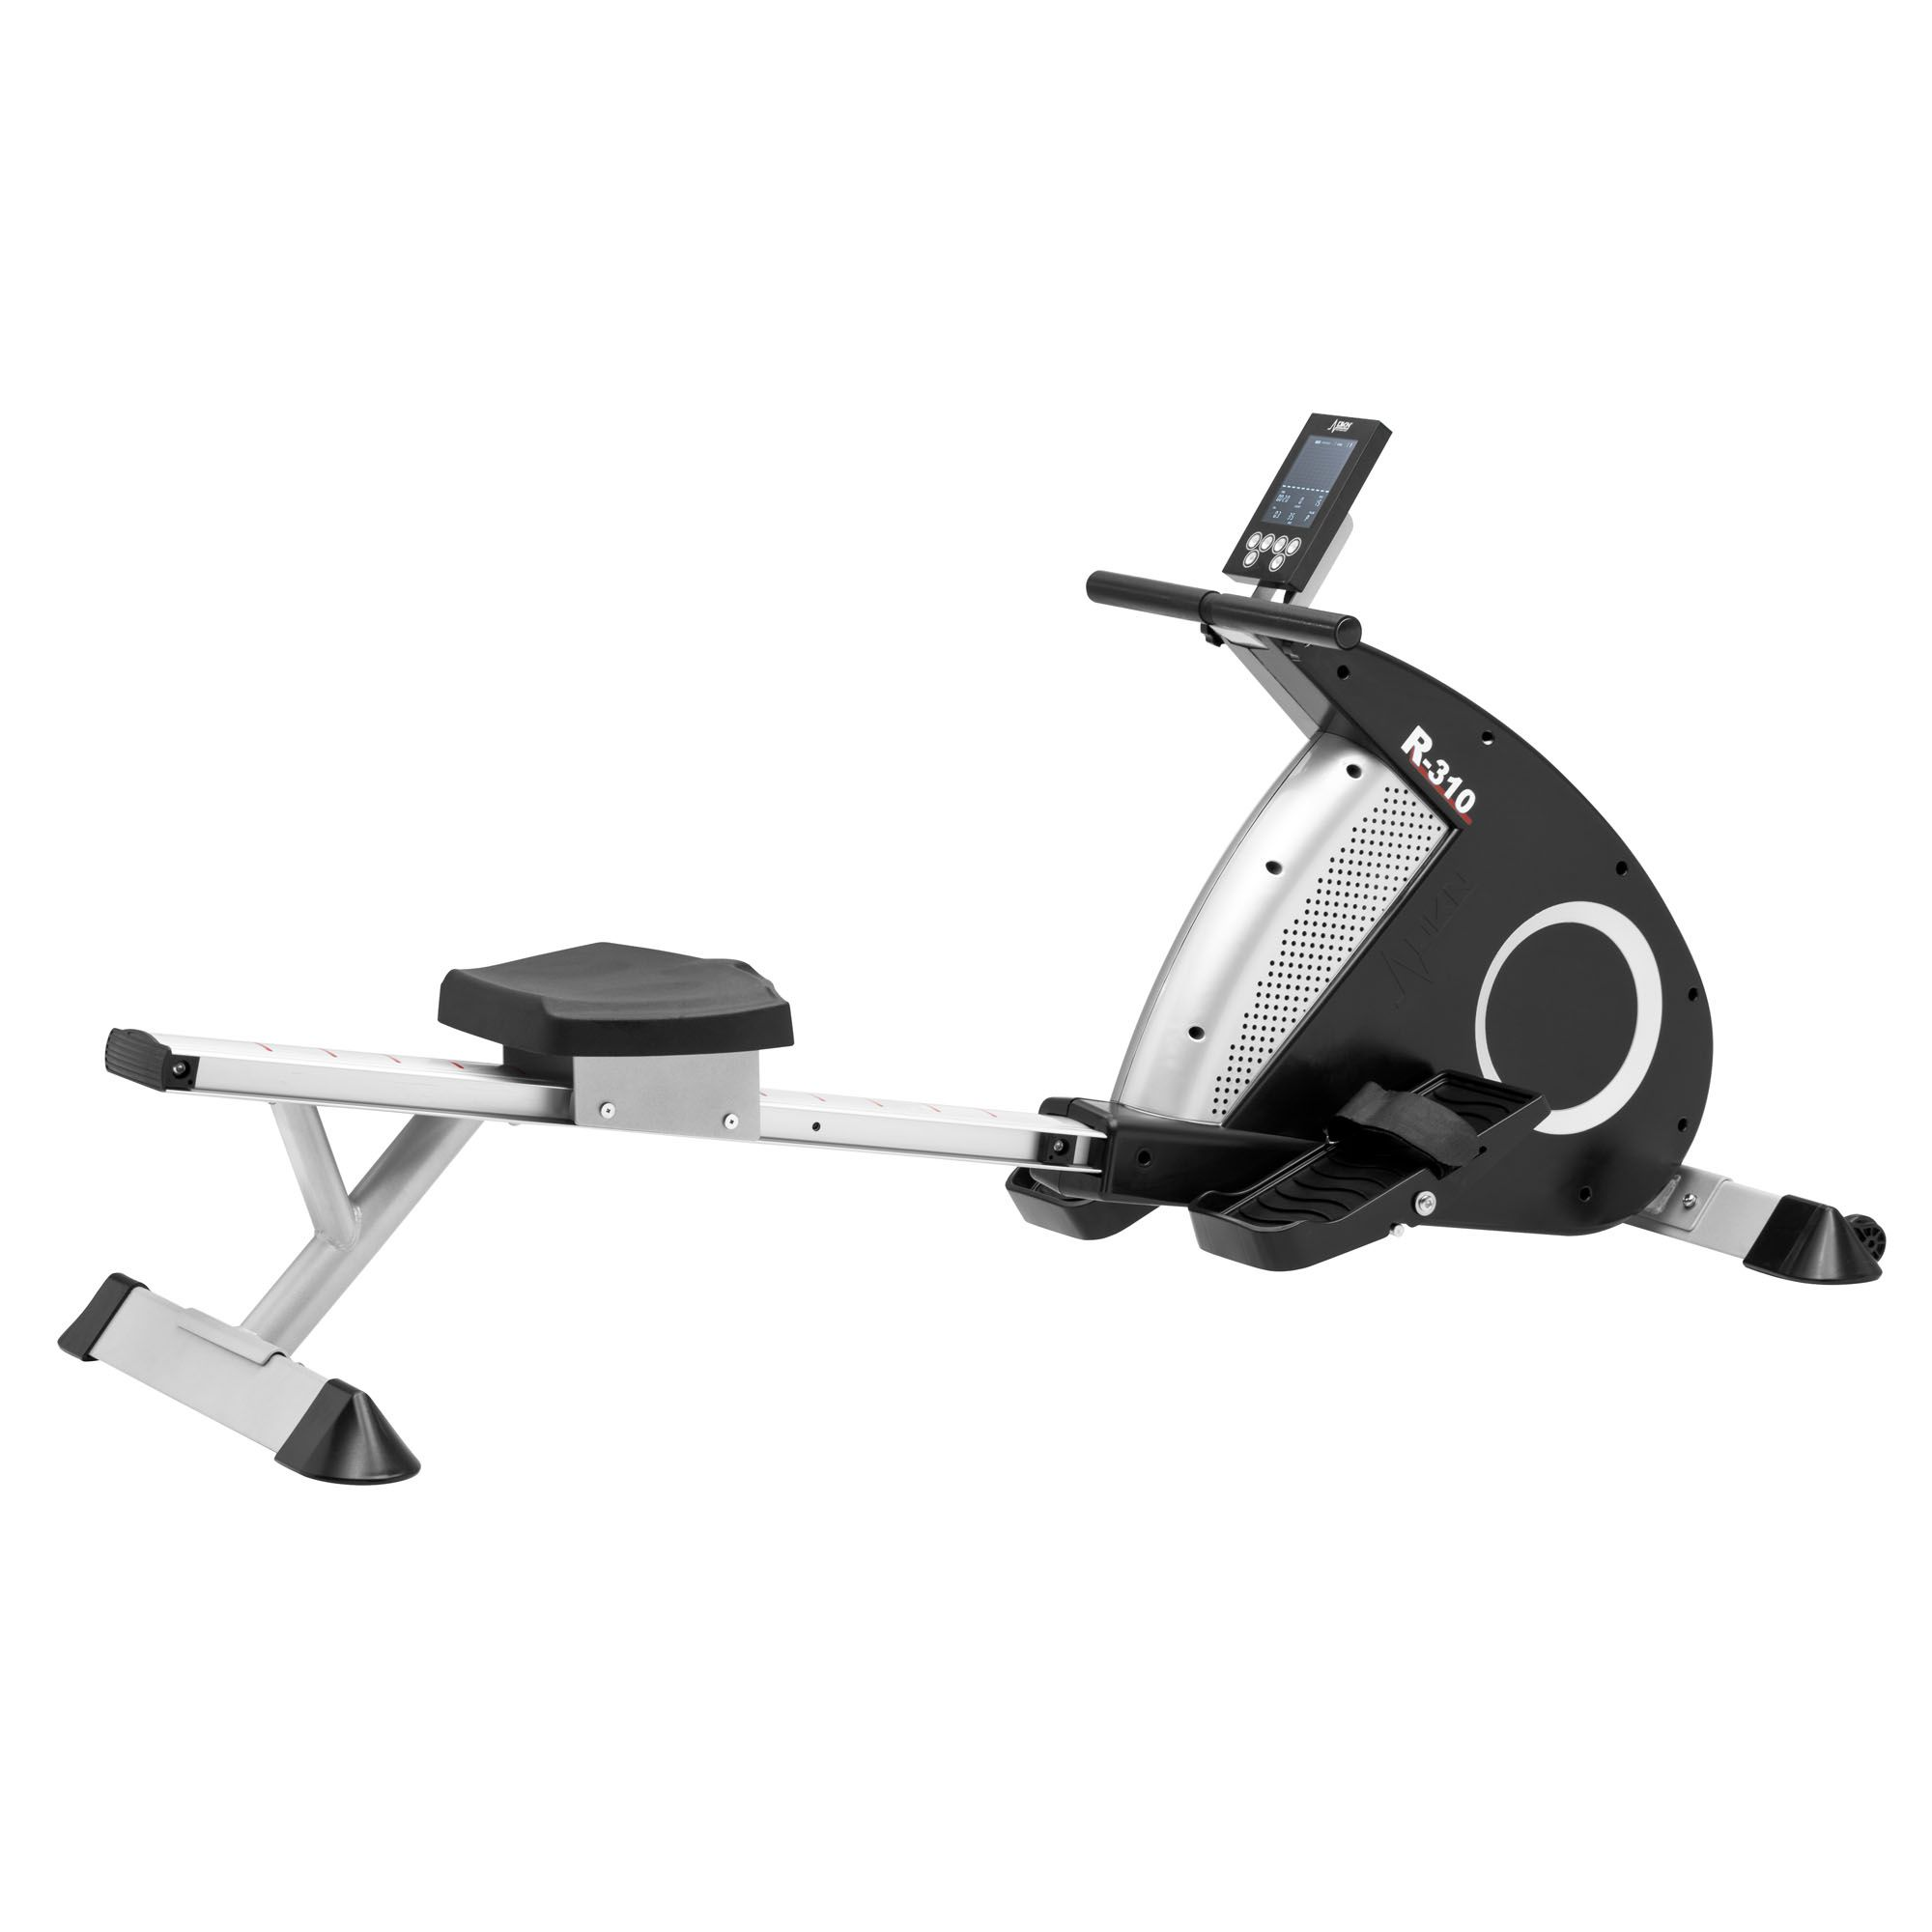 DKN R-310 Rowing Machine - Sweatband.com